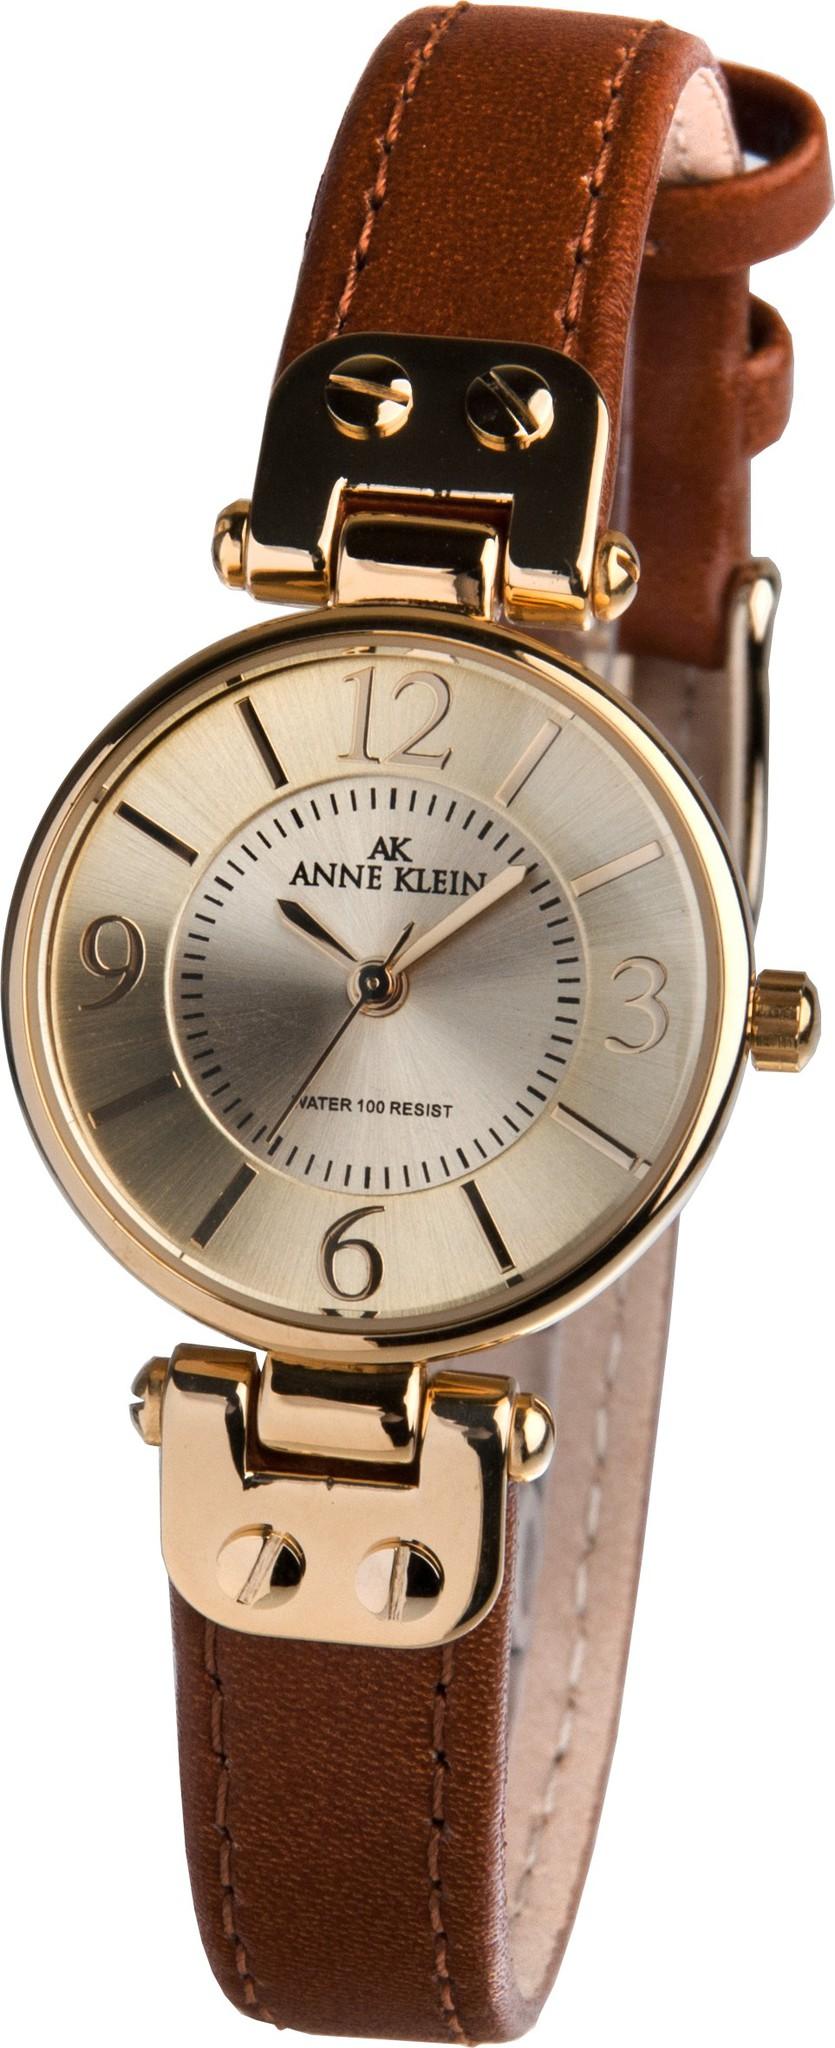 Anne Klein 9442CHHY - женские наручные часы из коллекции RingAnne Klein<br><br><br>Бренд: Anne Klein<br>Модель: Anne Klein 9442 CHHY<br>Артикул: 9442CHHY<br>Вариант артикула: None<br>Коллекция: Ring<br>Подколлекция: None<br>Страна: США<br>Пол: женские<br>Тип механизма: кварцевые<br>Механизм: None<br>Количество камней: None<br>Автоподзавод: None<br>Источник энергии: от батарейки<br>Срок службы элемента питания: None<br>Дисплей: стрелки<br>Цифры: арабские<br>Водозащита: WR 30<br>Противоударные: None<br>Материал корпуса: не указан, PVD покрытие (полное)<br>Материал браслета: кожа<br>Материал безеля: None<br>Стекло: минеральное<br>Антибликовое покрытие: None<br>Цвет корпуса: None<br>Цвет браслета: None<br>Цвет циферблата: None<br>Цвет безеля: None<br>Размеры: 28 мм<br>Диаметр: None<br>Диаметр корпуса: None<br>Толщина: None<br>Ширина ремешка: None<br>Вес: None<br>Спорт-функции: None<br>Подсветка: None<br>Вставка: None<br>Отображение даты: None<br>Хронограф: None<br>Таймер: None<br>Термометр: None<br>Хронометр: None<br>GPS: None<br>Радиосинхронизация: None<br>Барометр: None<br>Скелетон: None<br>Дополнительная информация: None<br>Дополнительные функции: None